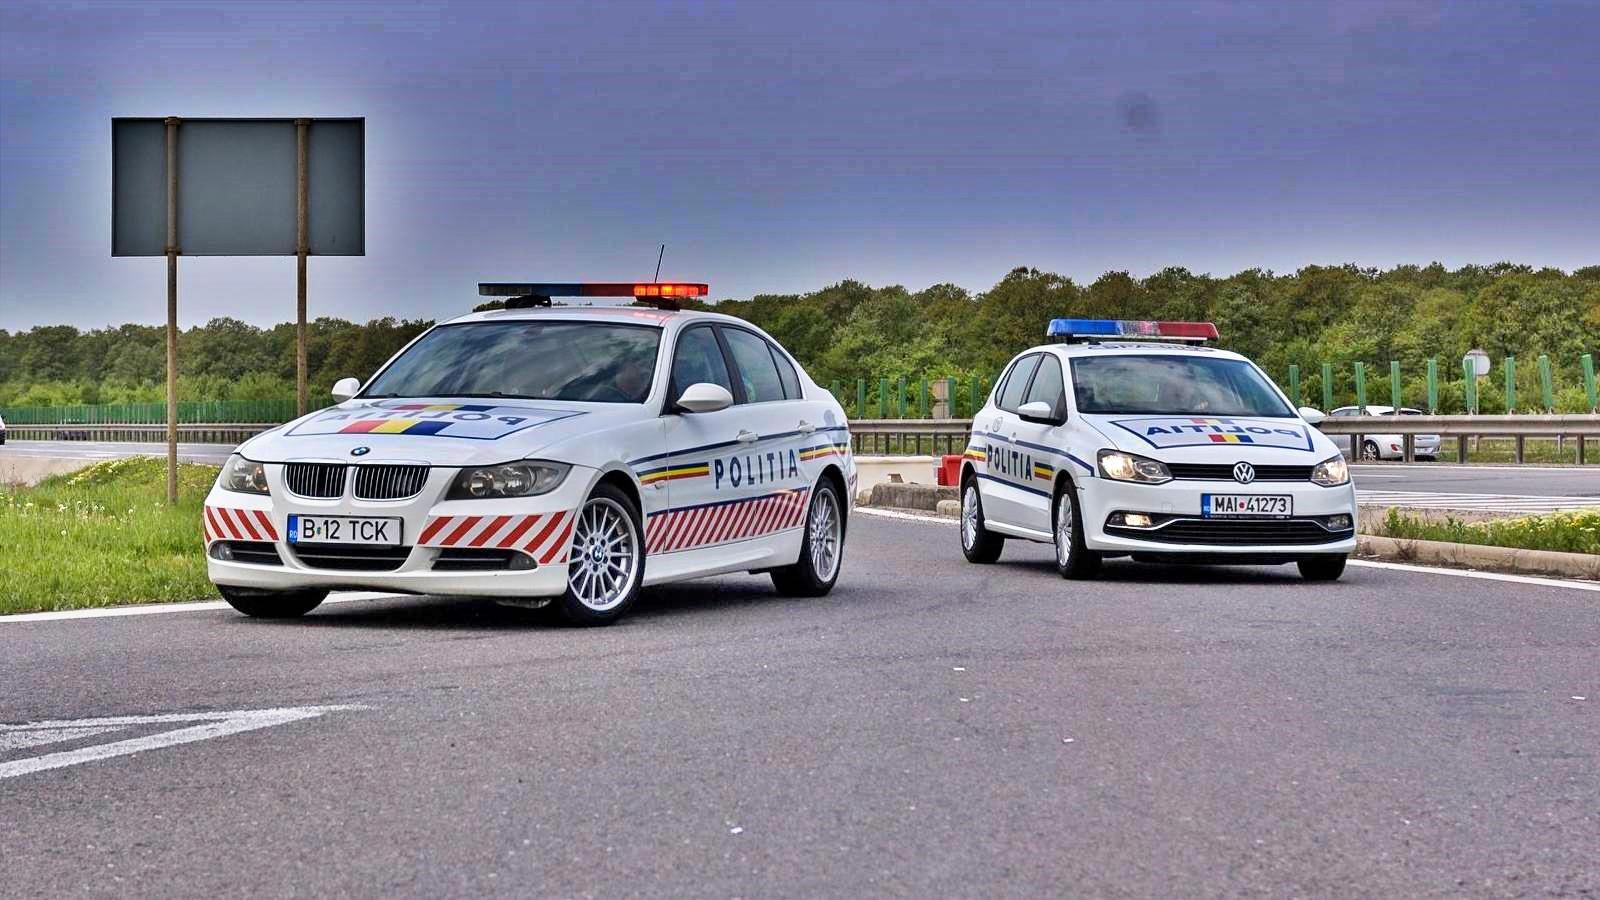 Politia Romana mesaj prevenire consum alcool volan